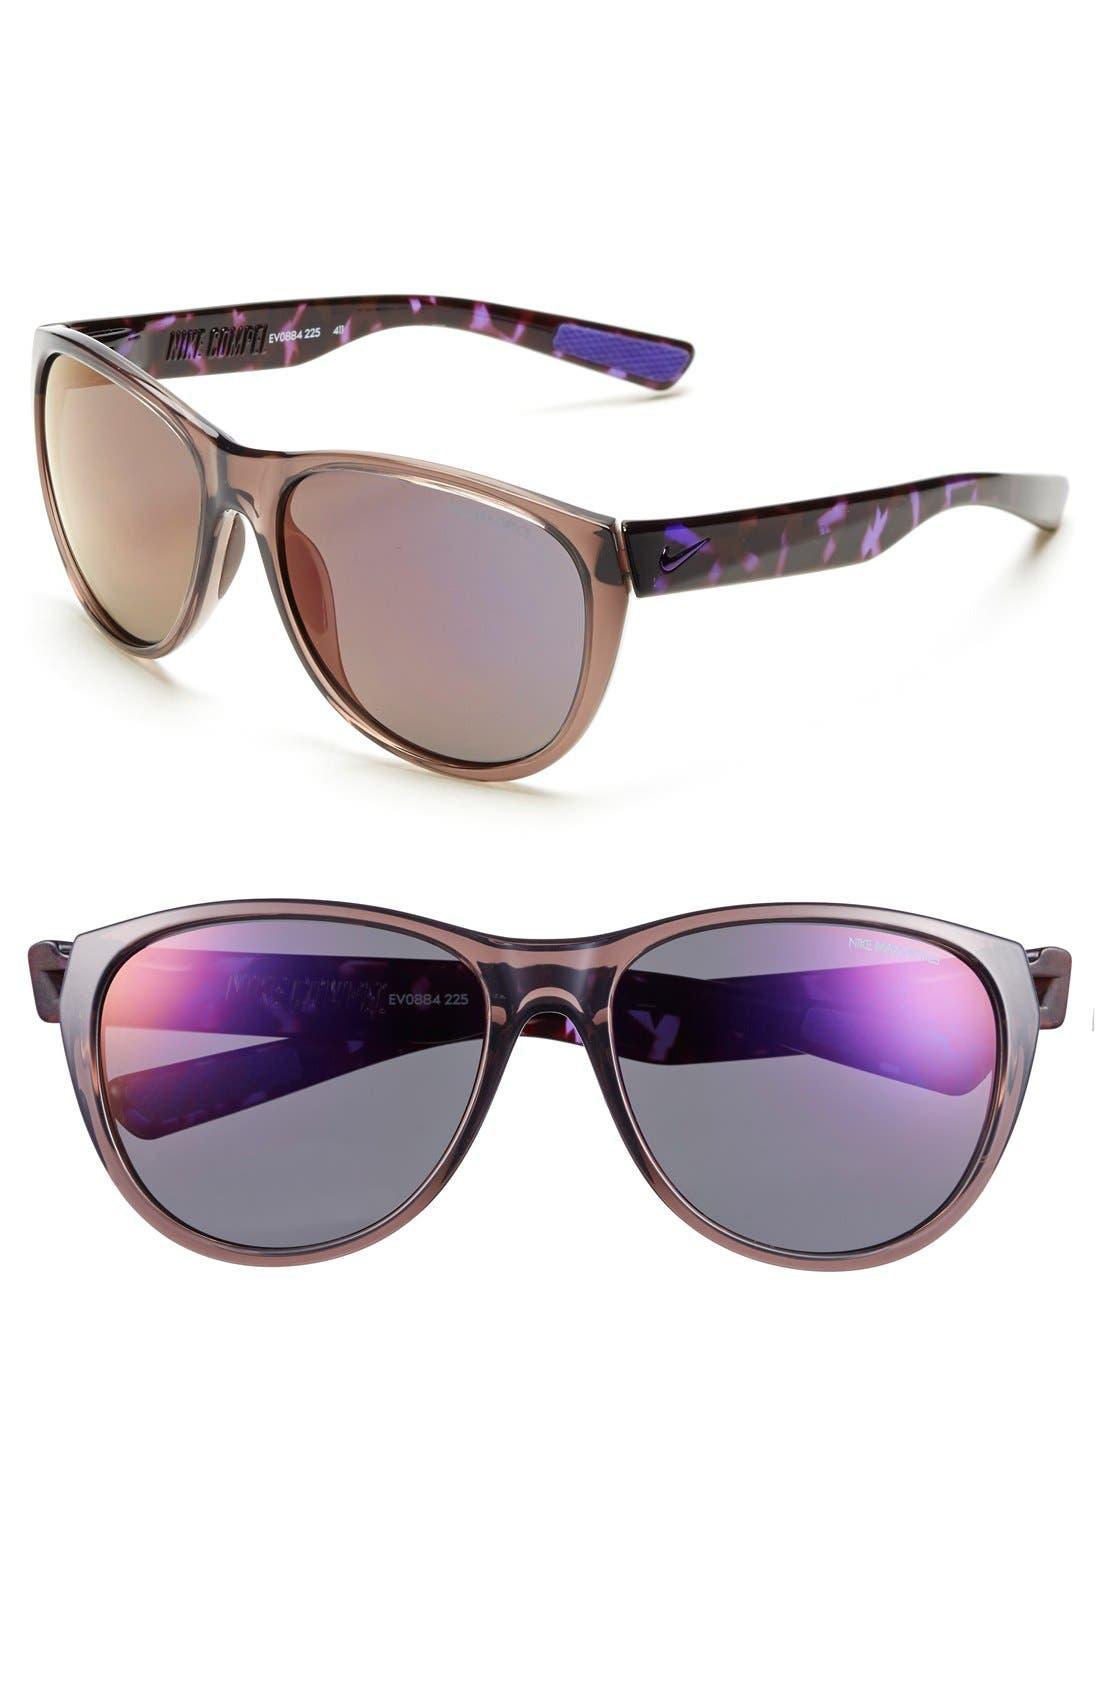 'Compel' 58mm Sunglasses,                             Main thumbnail 1, color,                             Crystal Violet/ Grape Tortoise